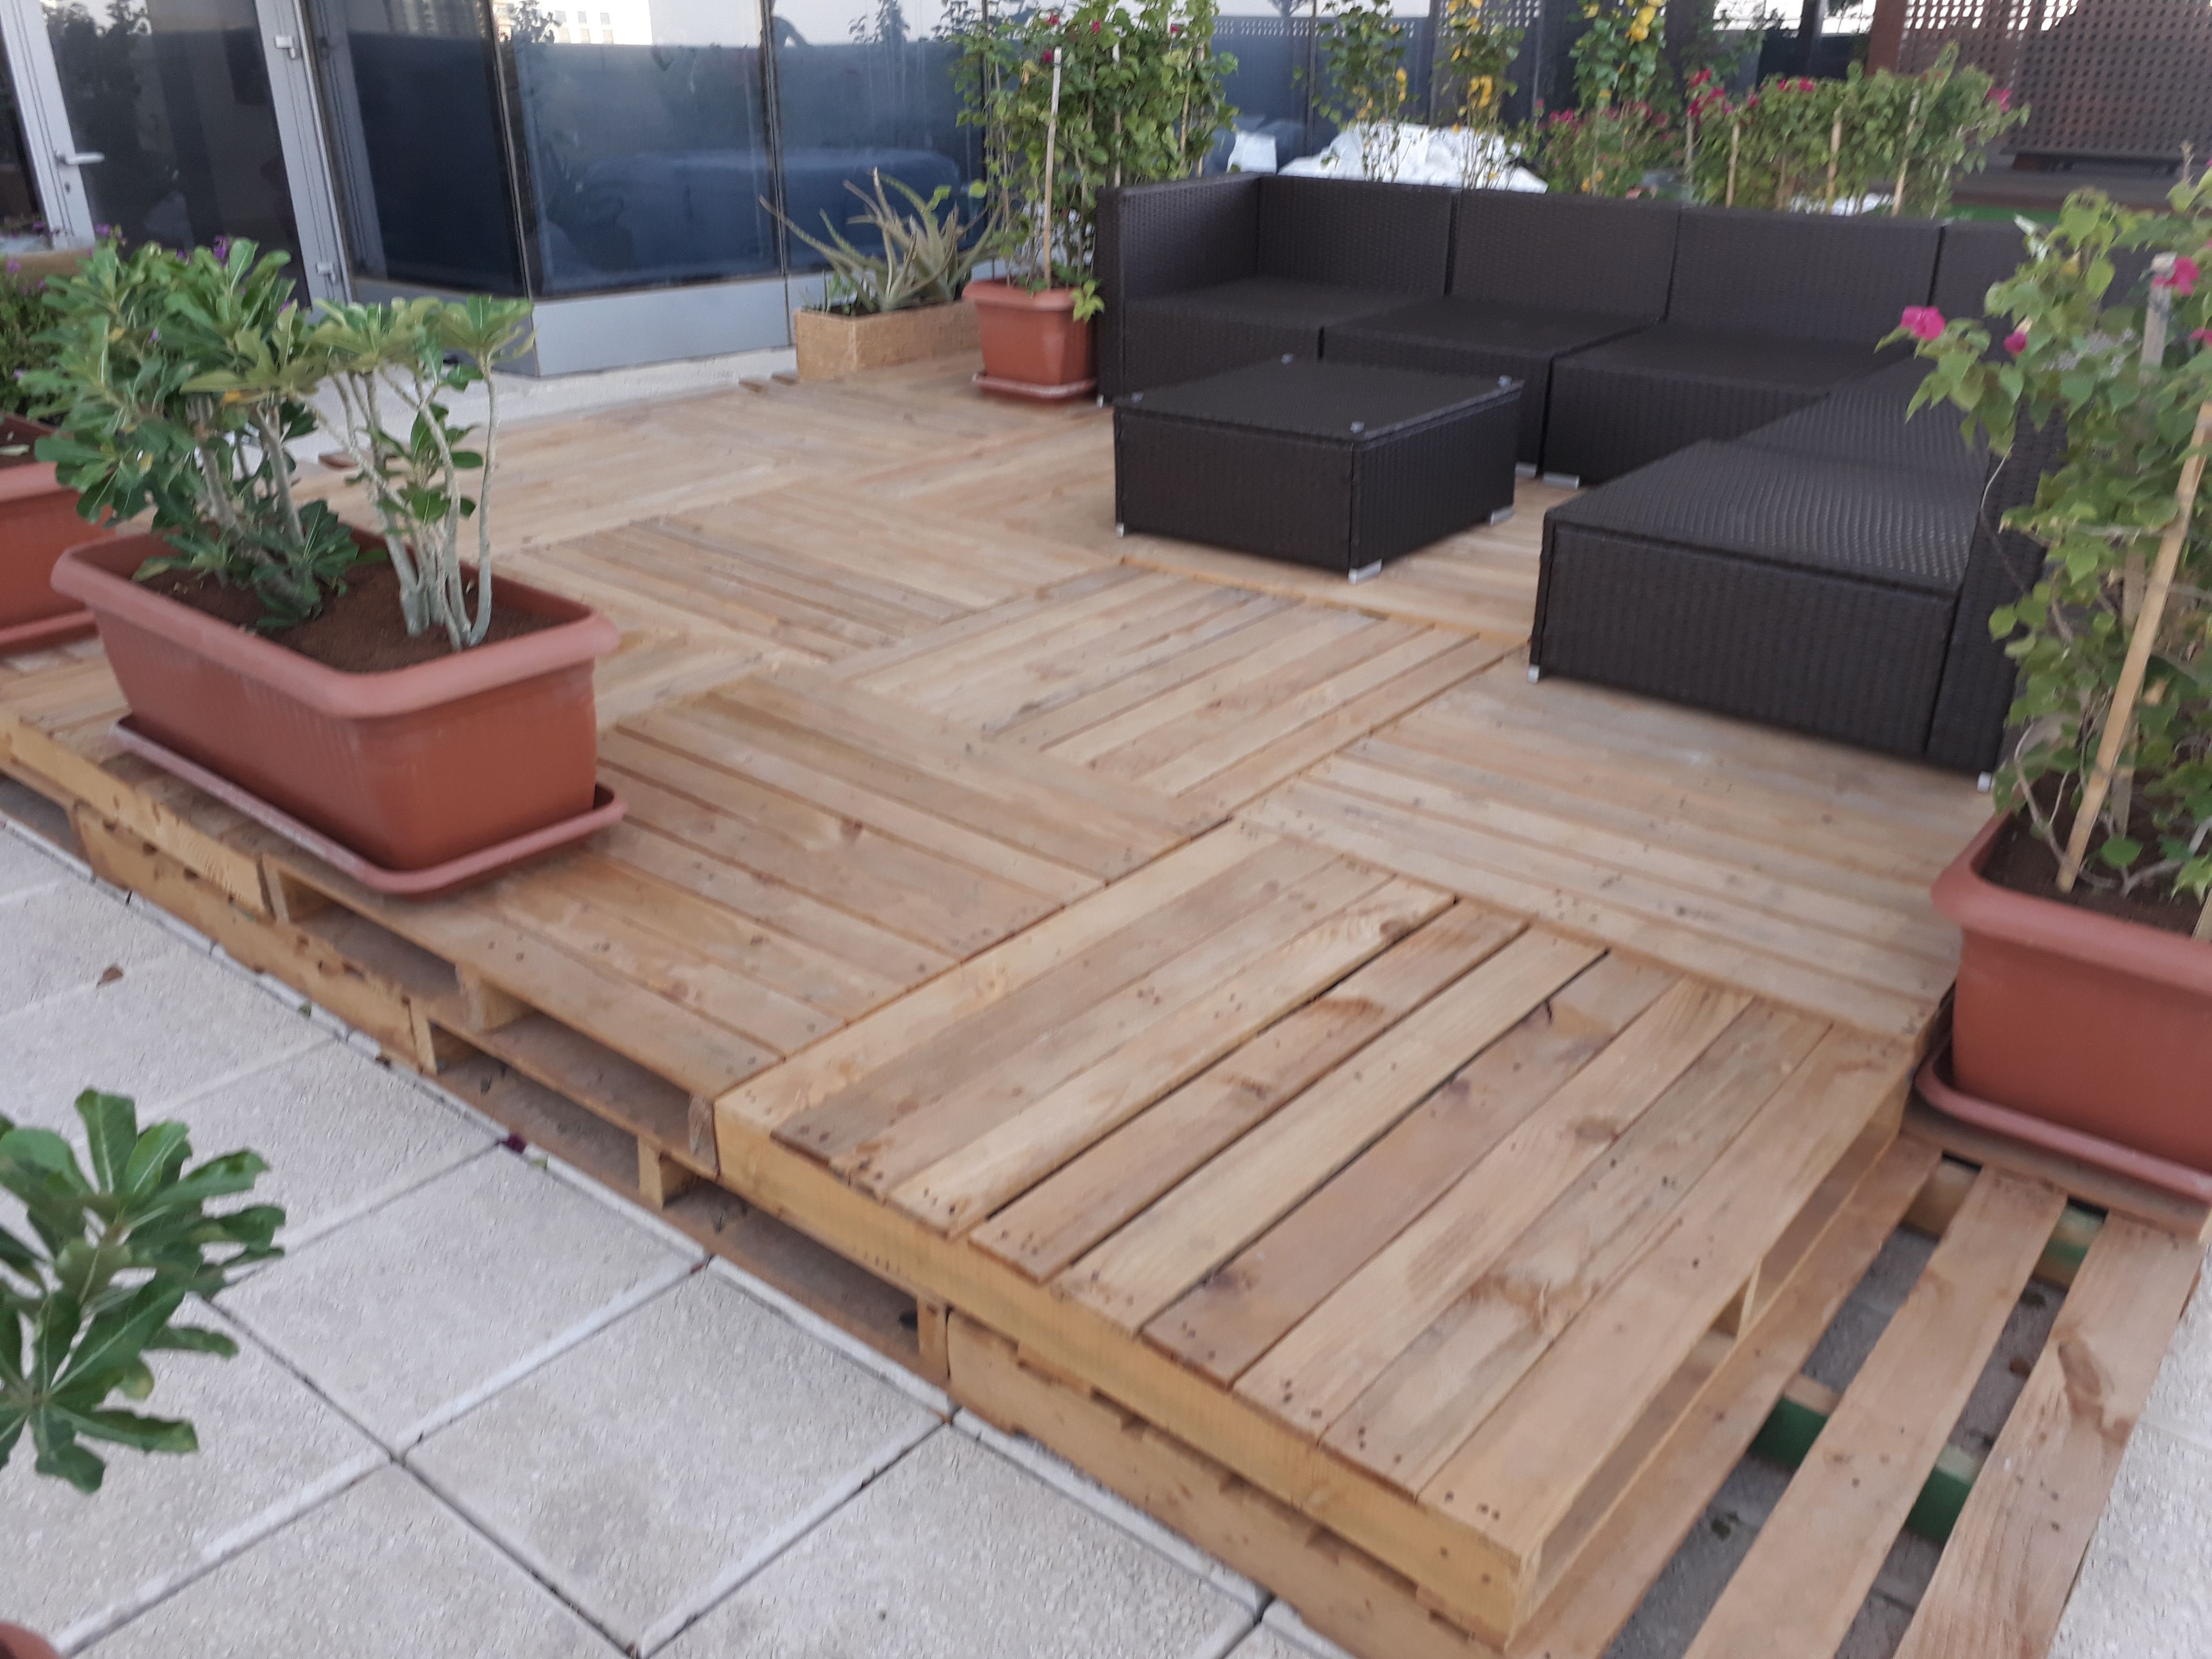 Wooden Pallets 0555450341 6